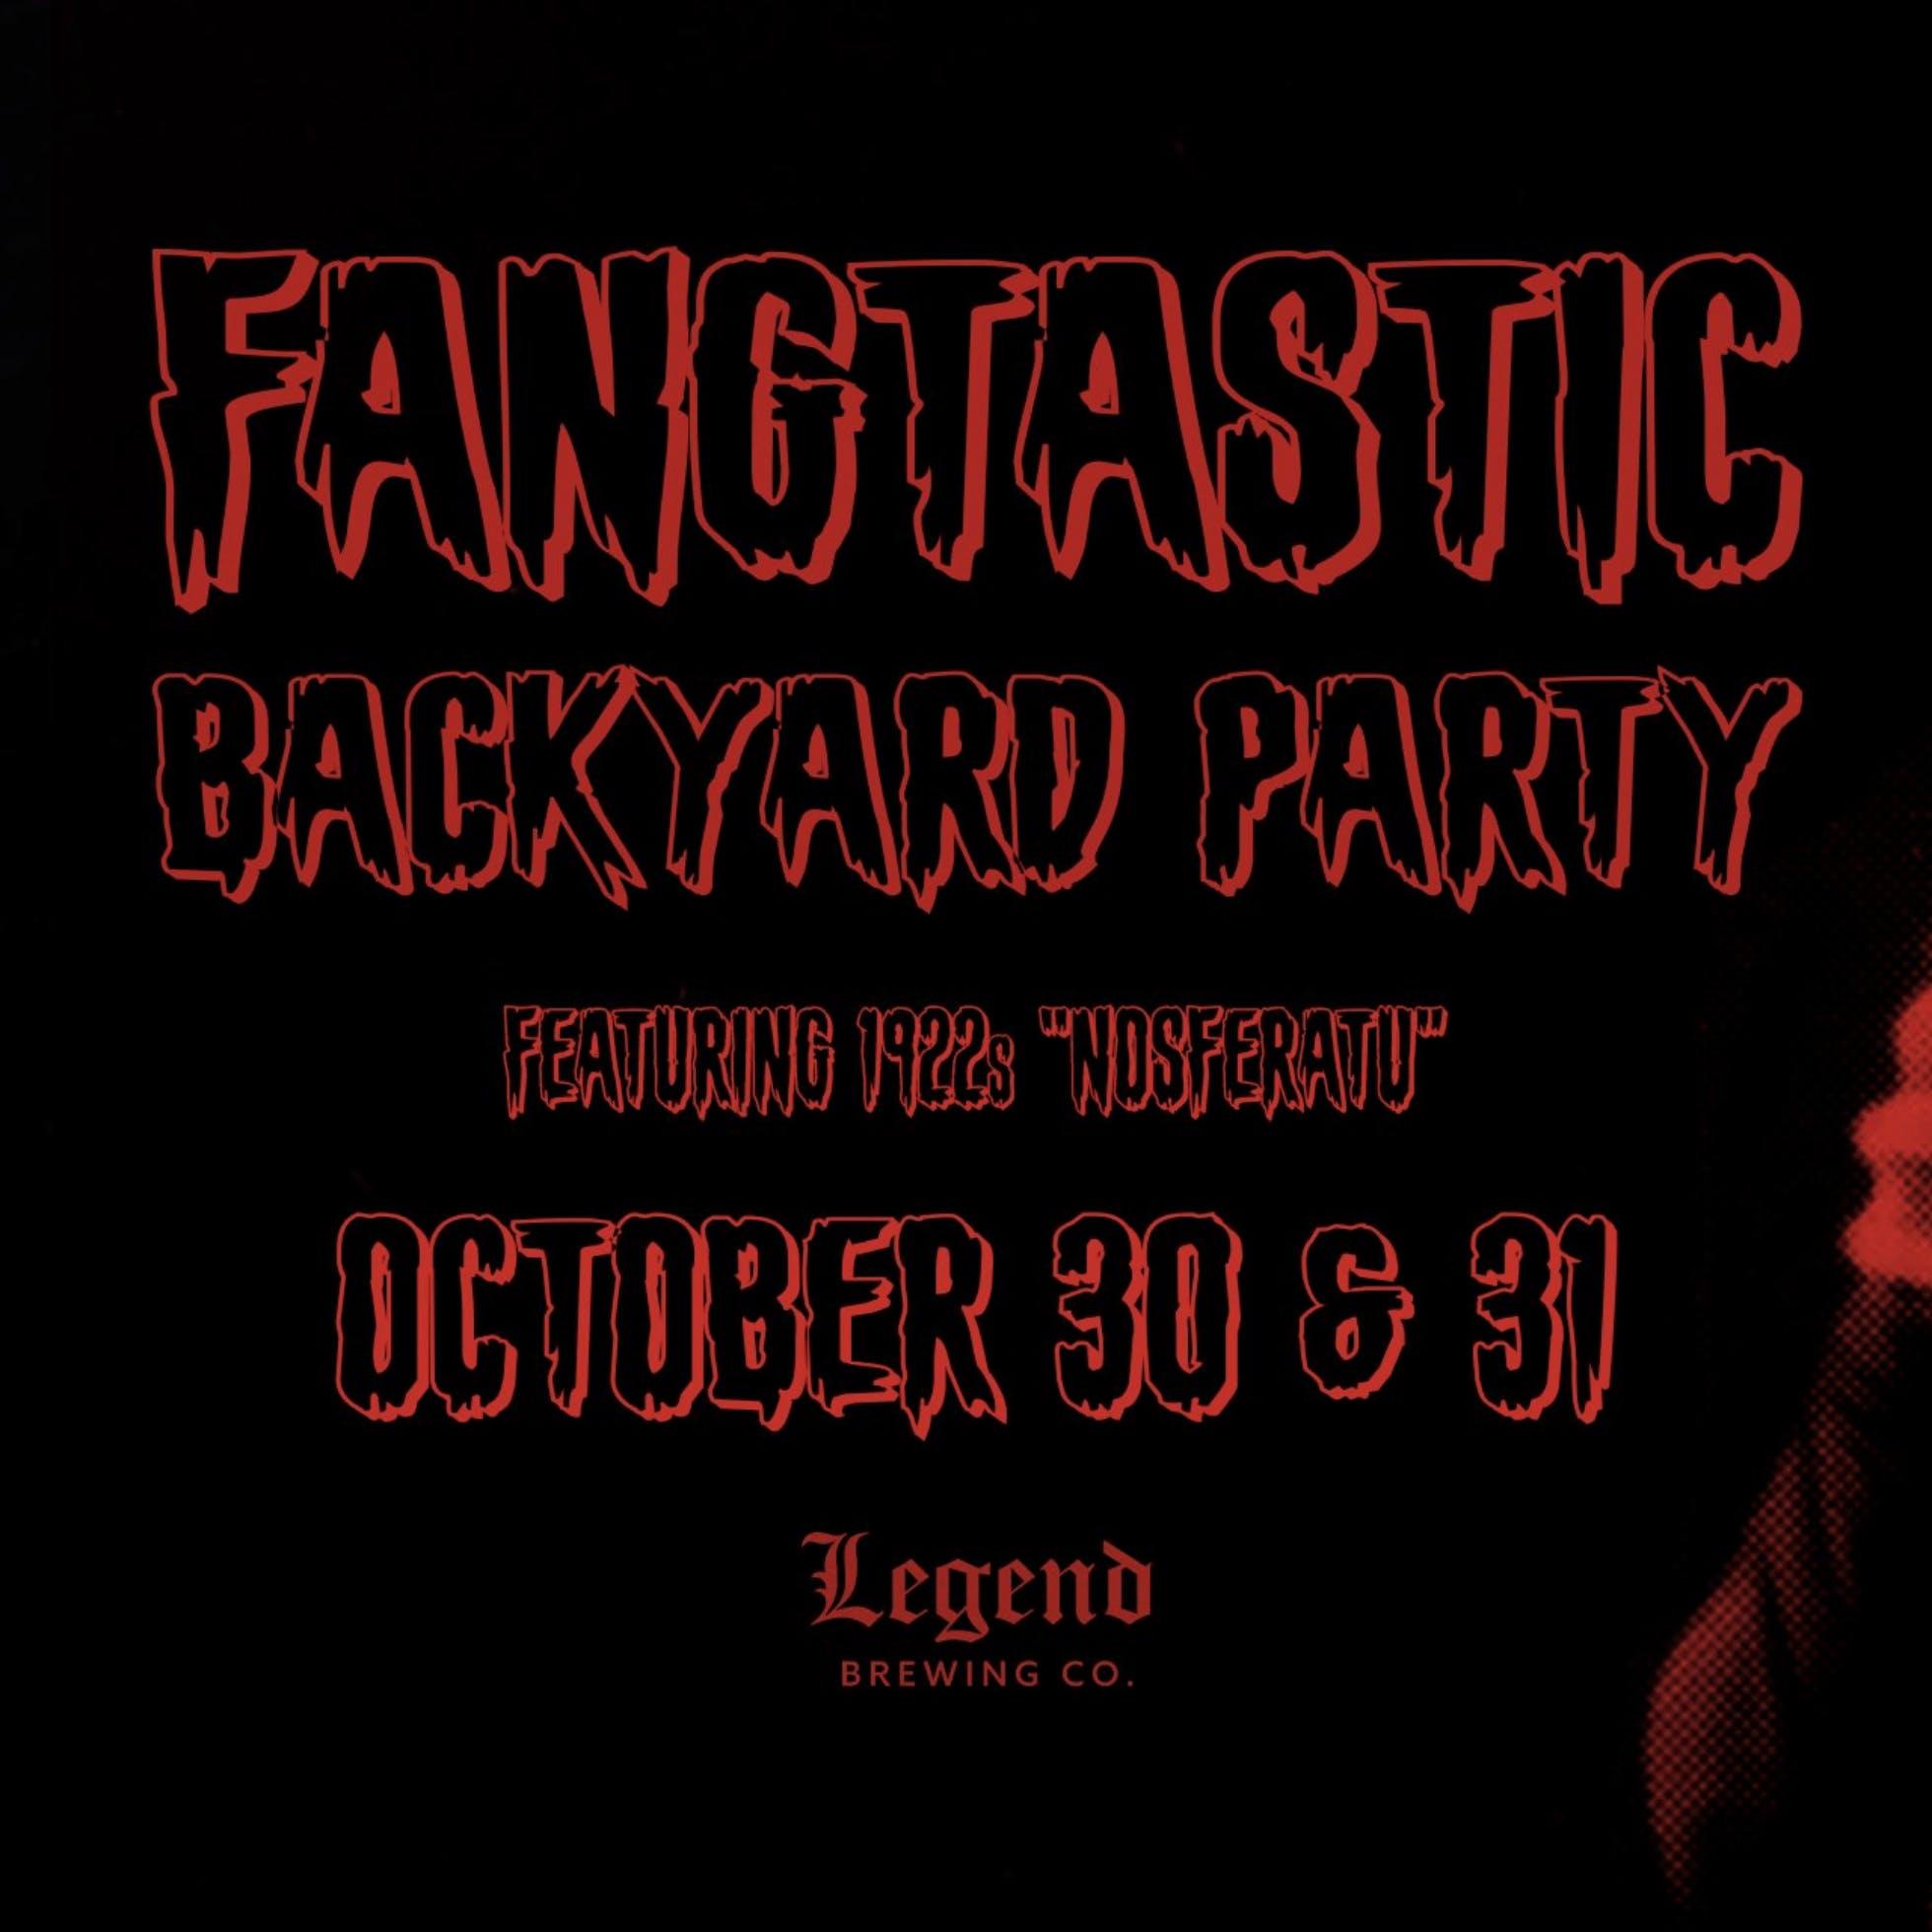 Legend Brewing's Fangtastic Backyard Party